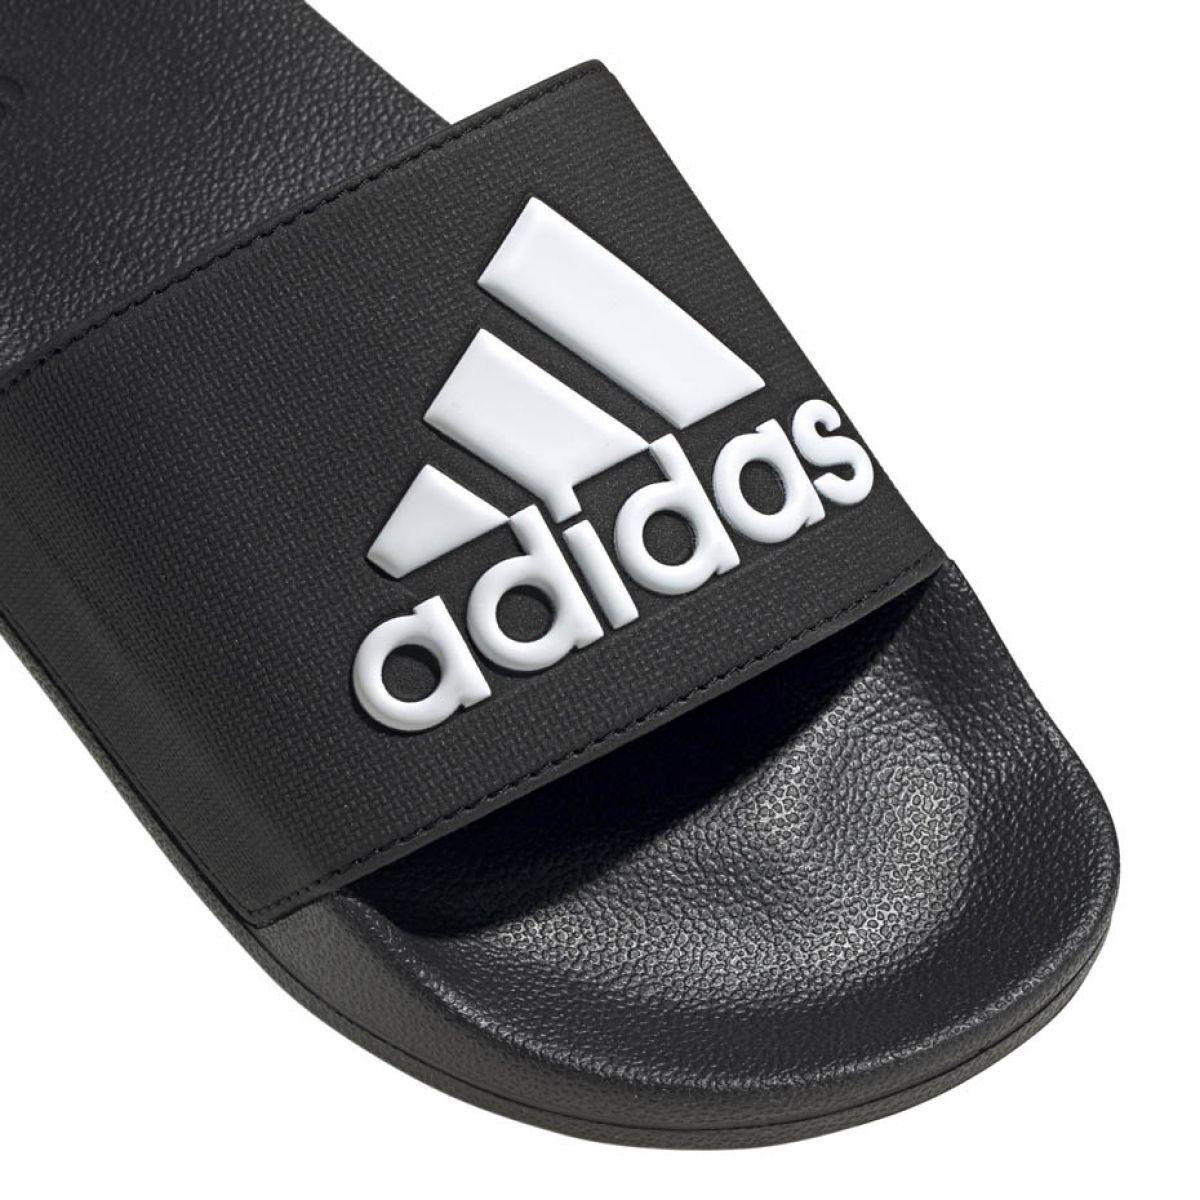 adecuado para hombres/mujeres Zapatos 2018 moda atractiva Adidas Adilette Shower M F34770 slippers black | Adidas, Black ...